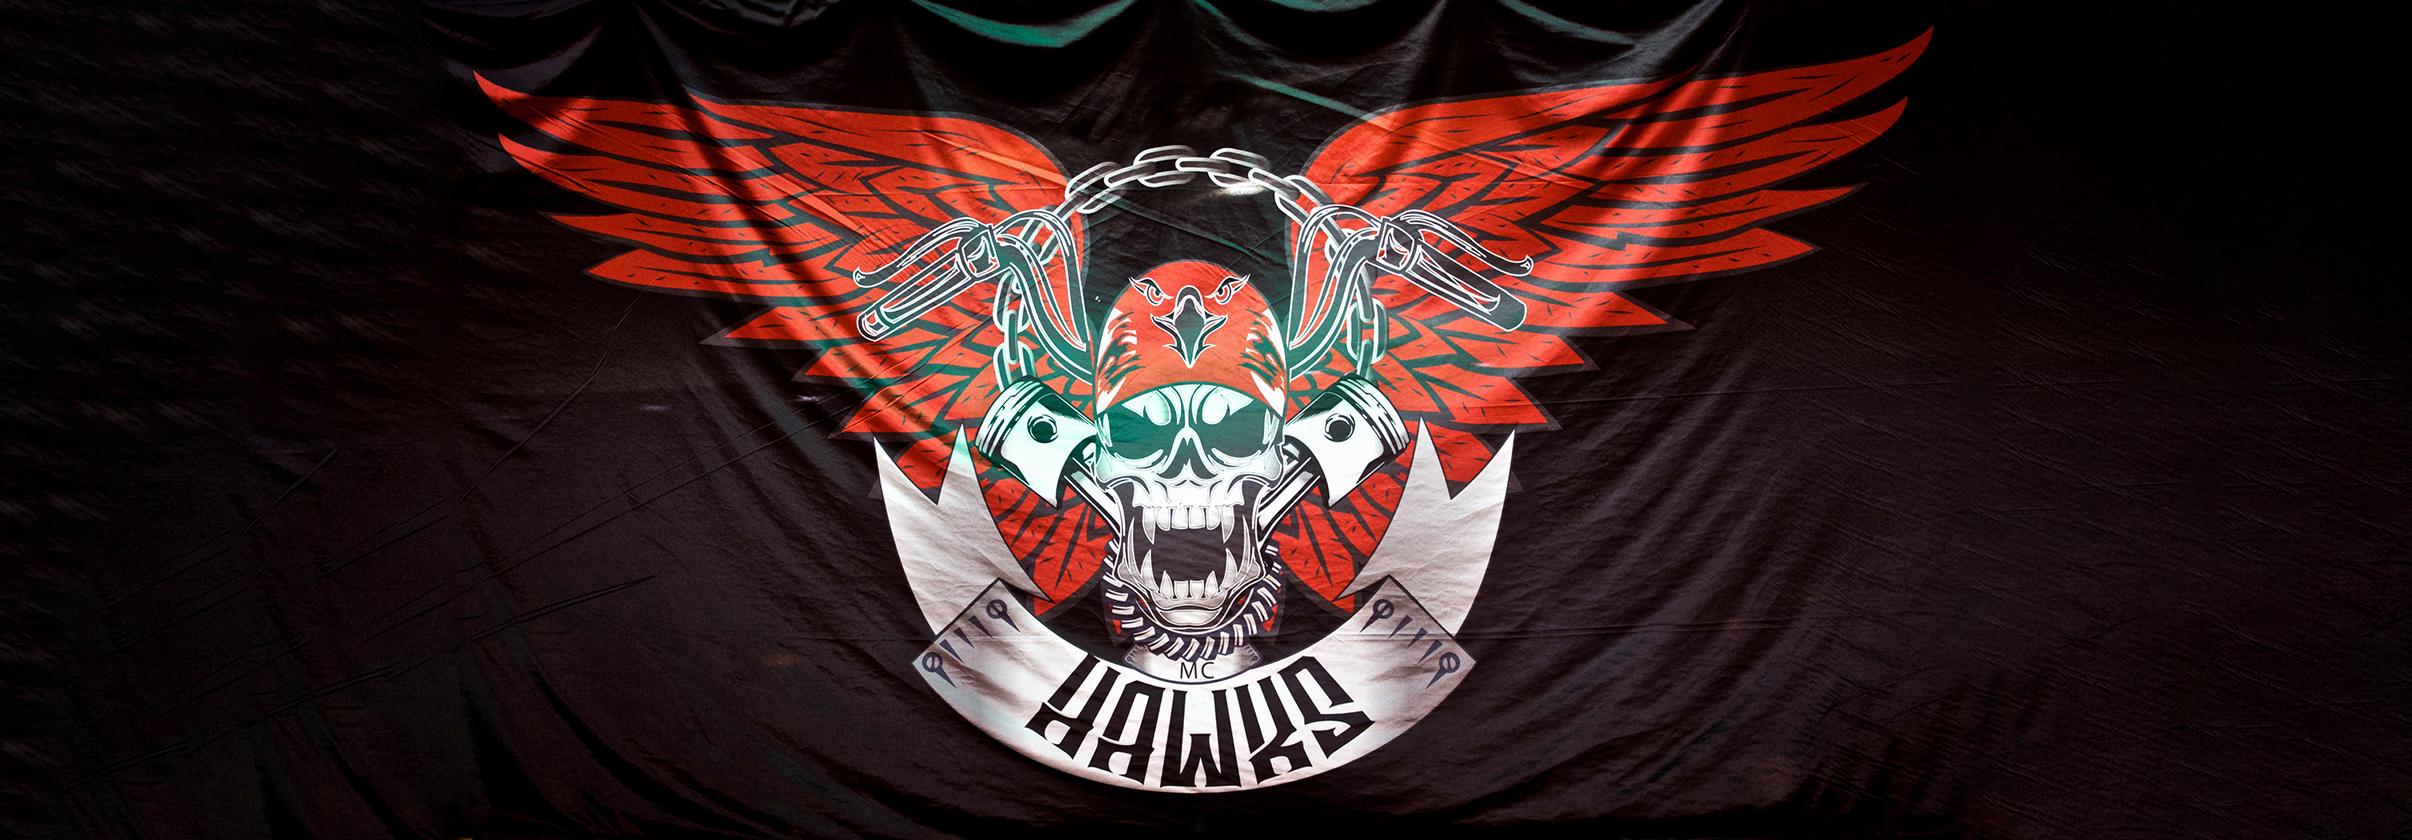 hawks-web-images